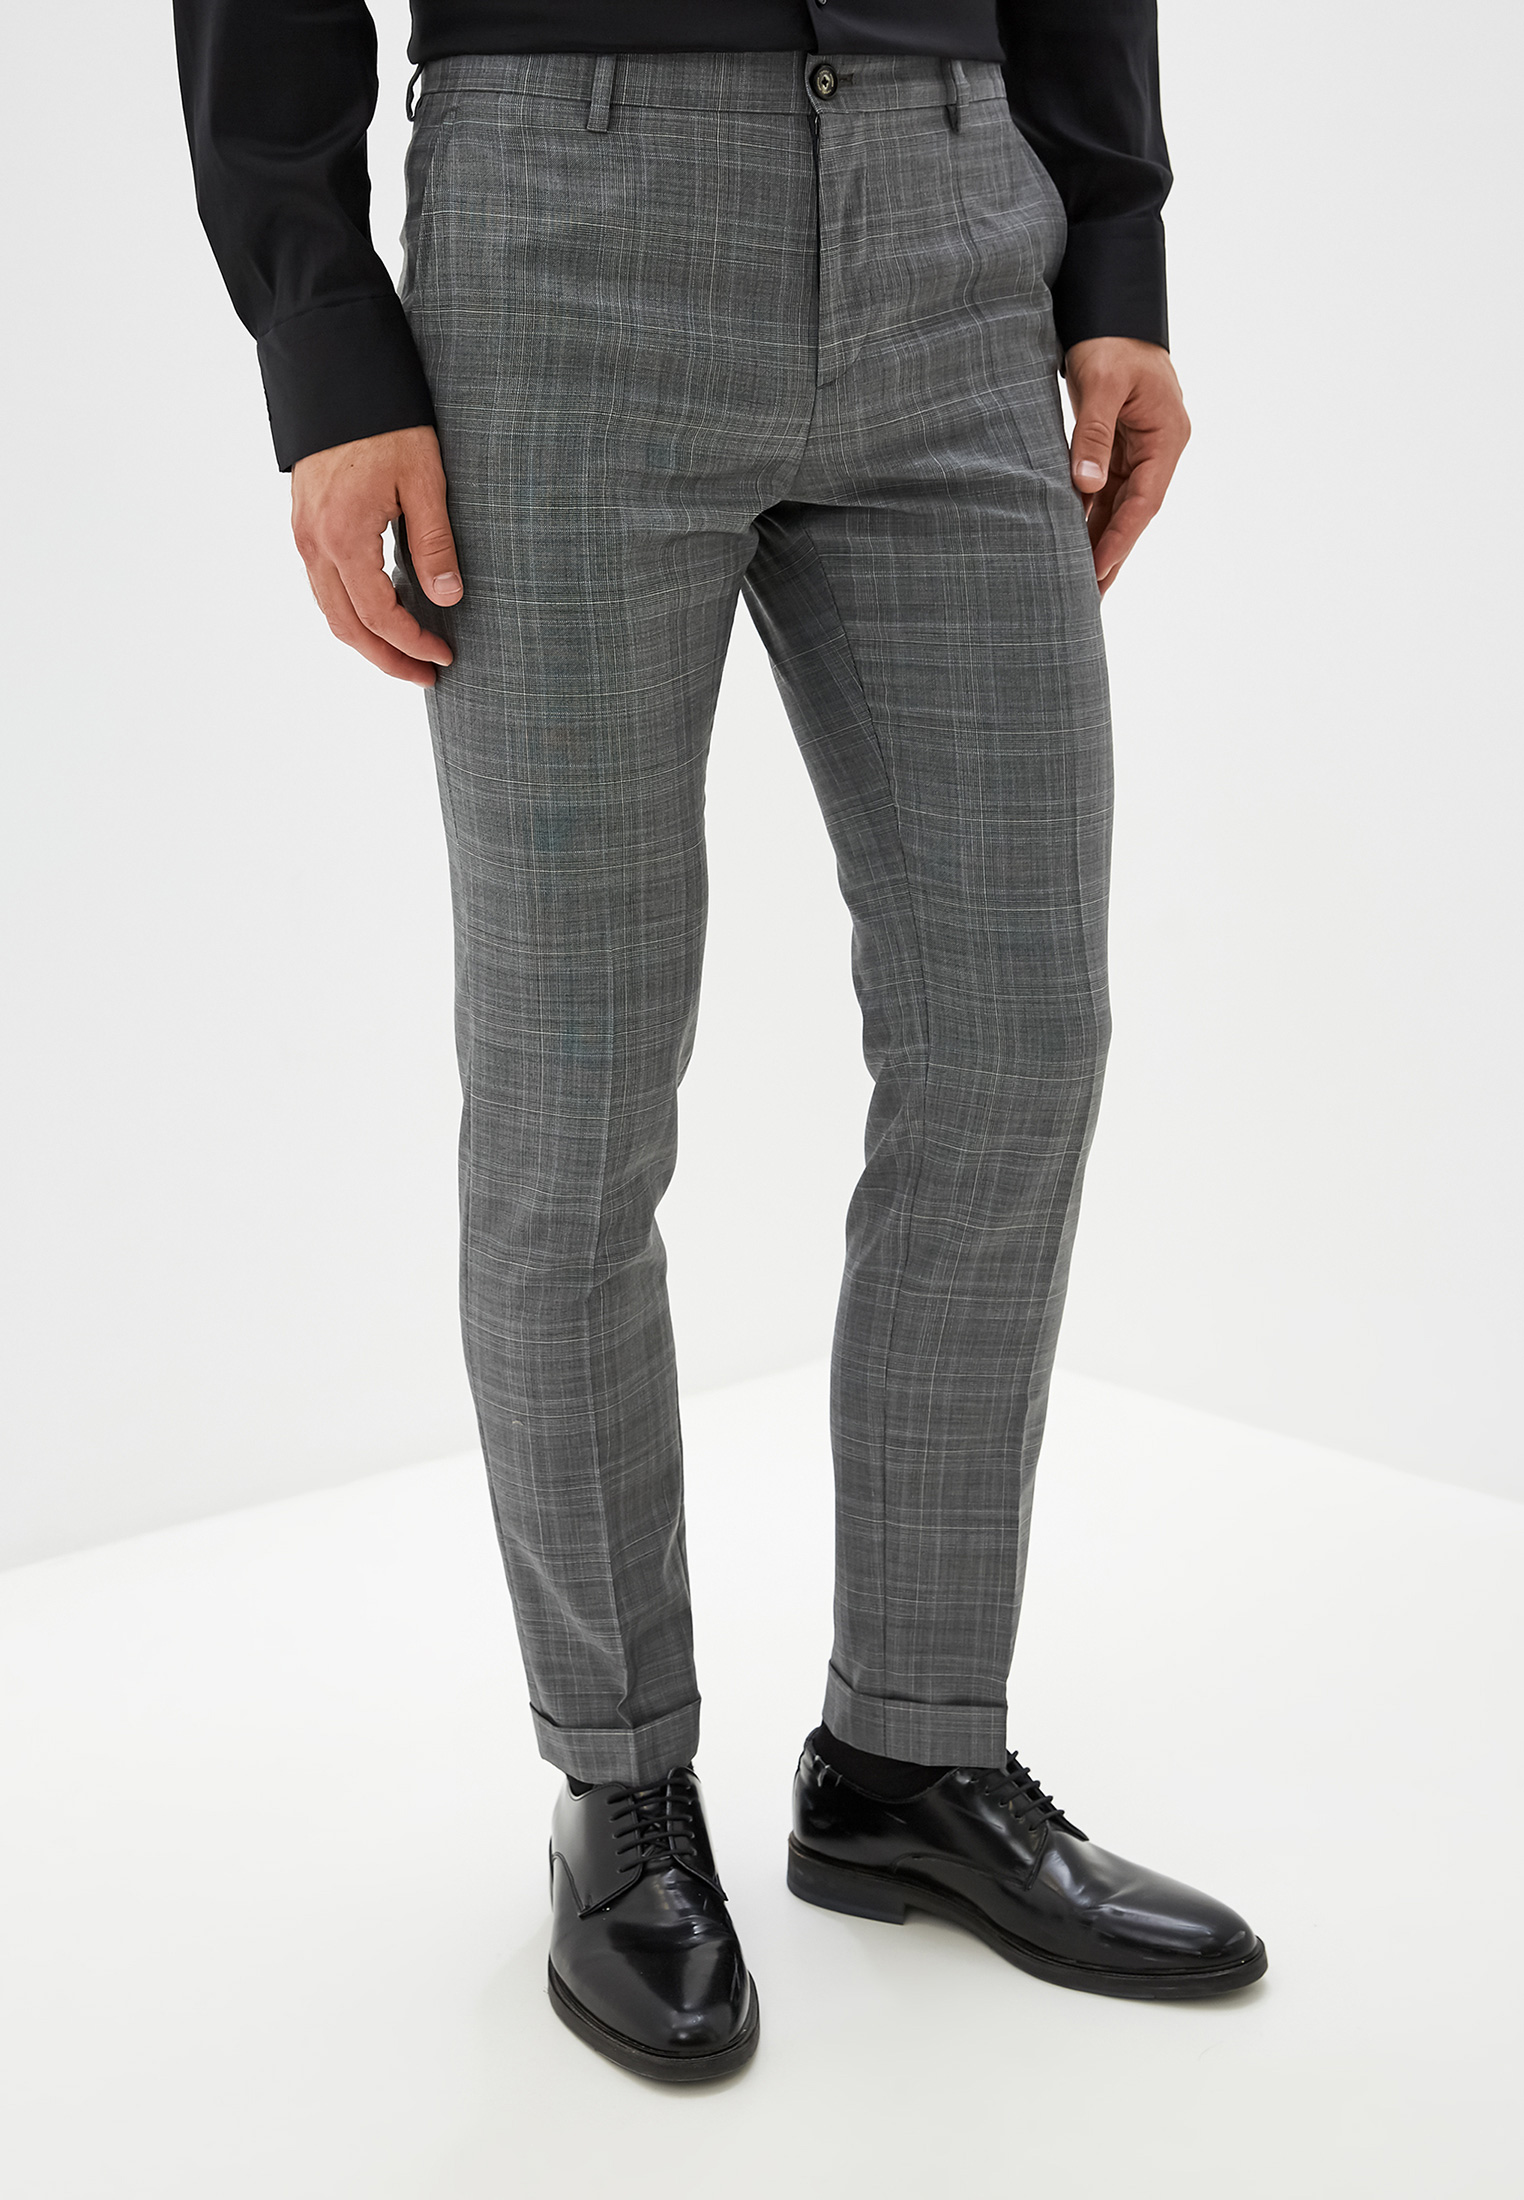 Мужские классические брюки Tommy Hilfiger (Томми Хилфигер) TT0TT05820